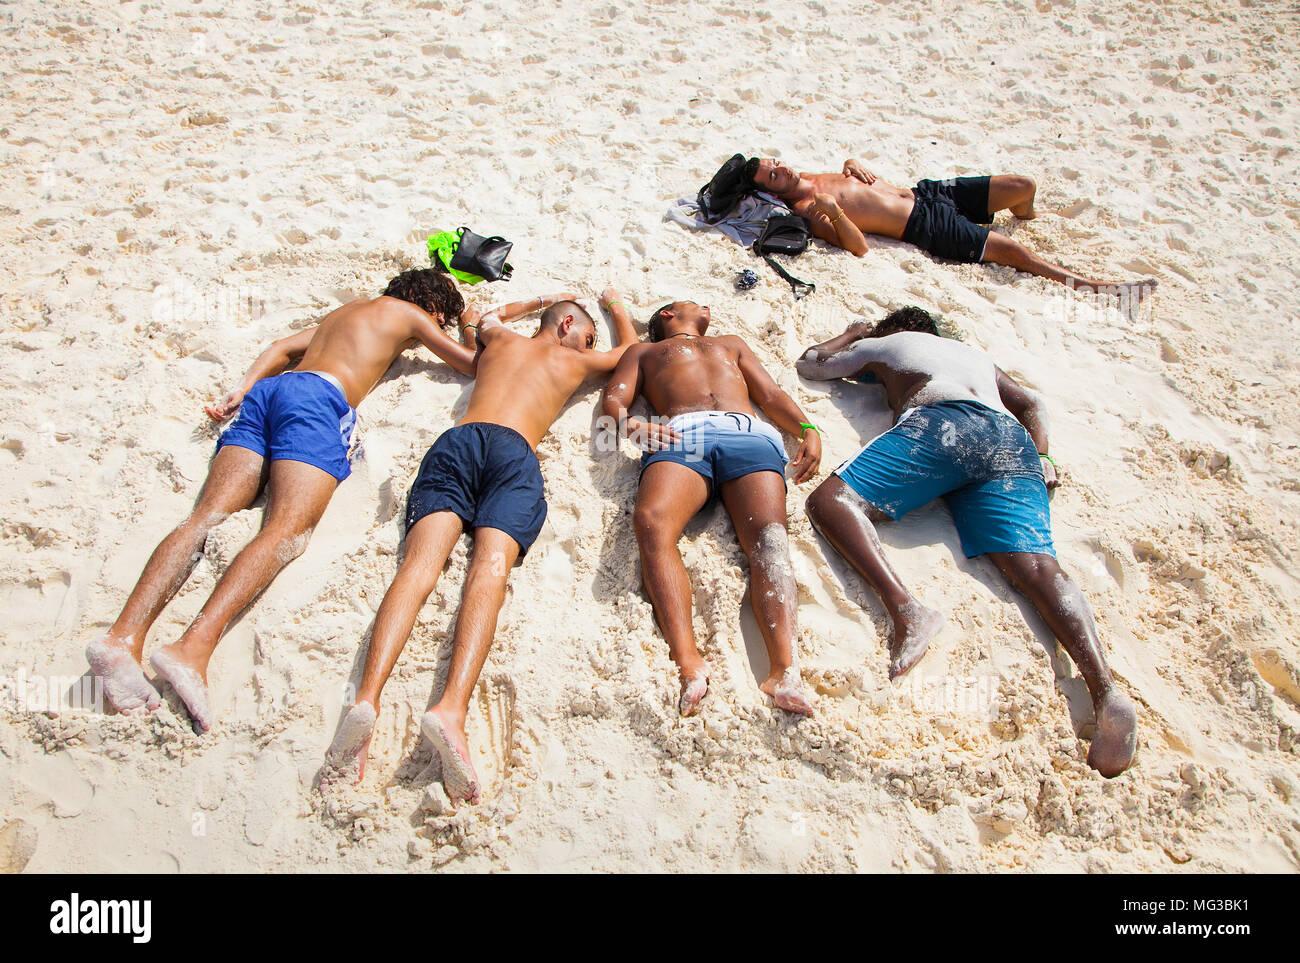 PHUKET, THAILND. JAN 25, 2016: Sleeping after full moon party on  Koh Mang beach on Jan 25, 2016, Thailand. - Stock Image